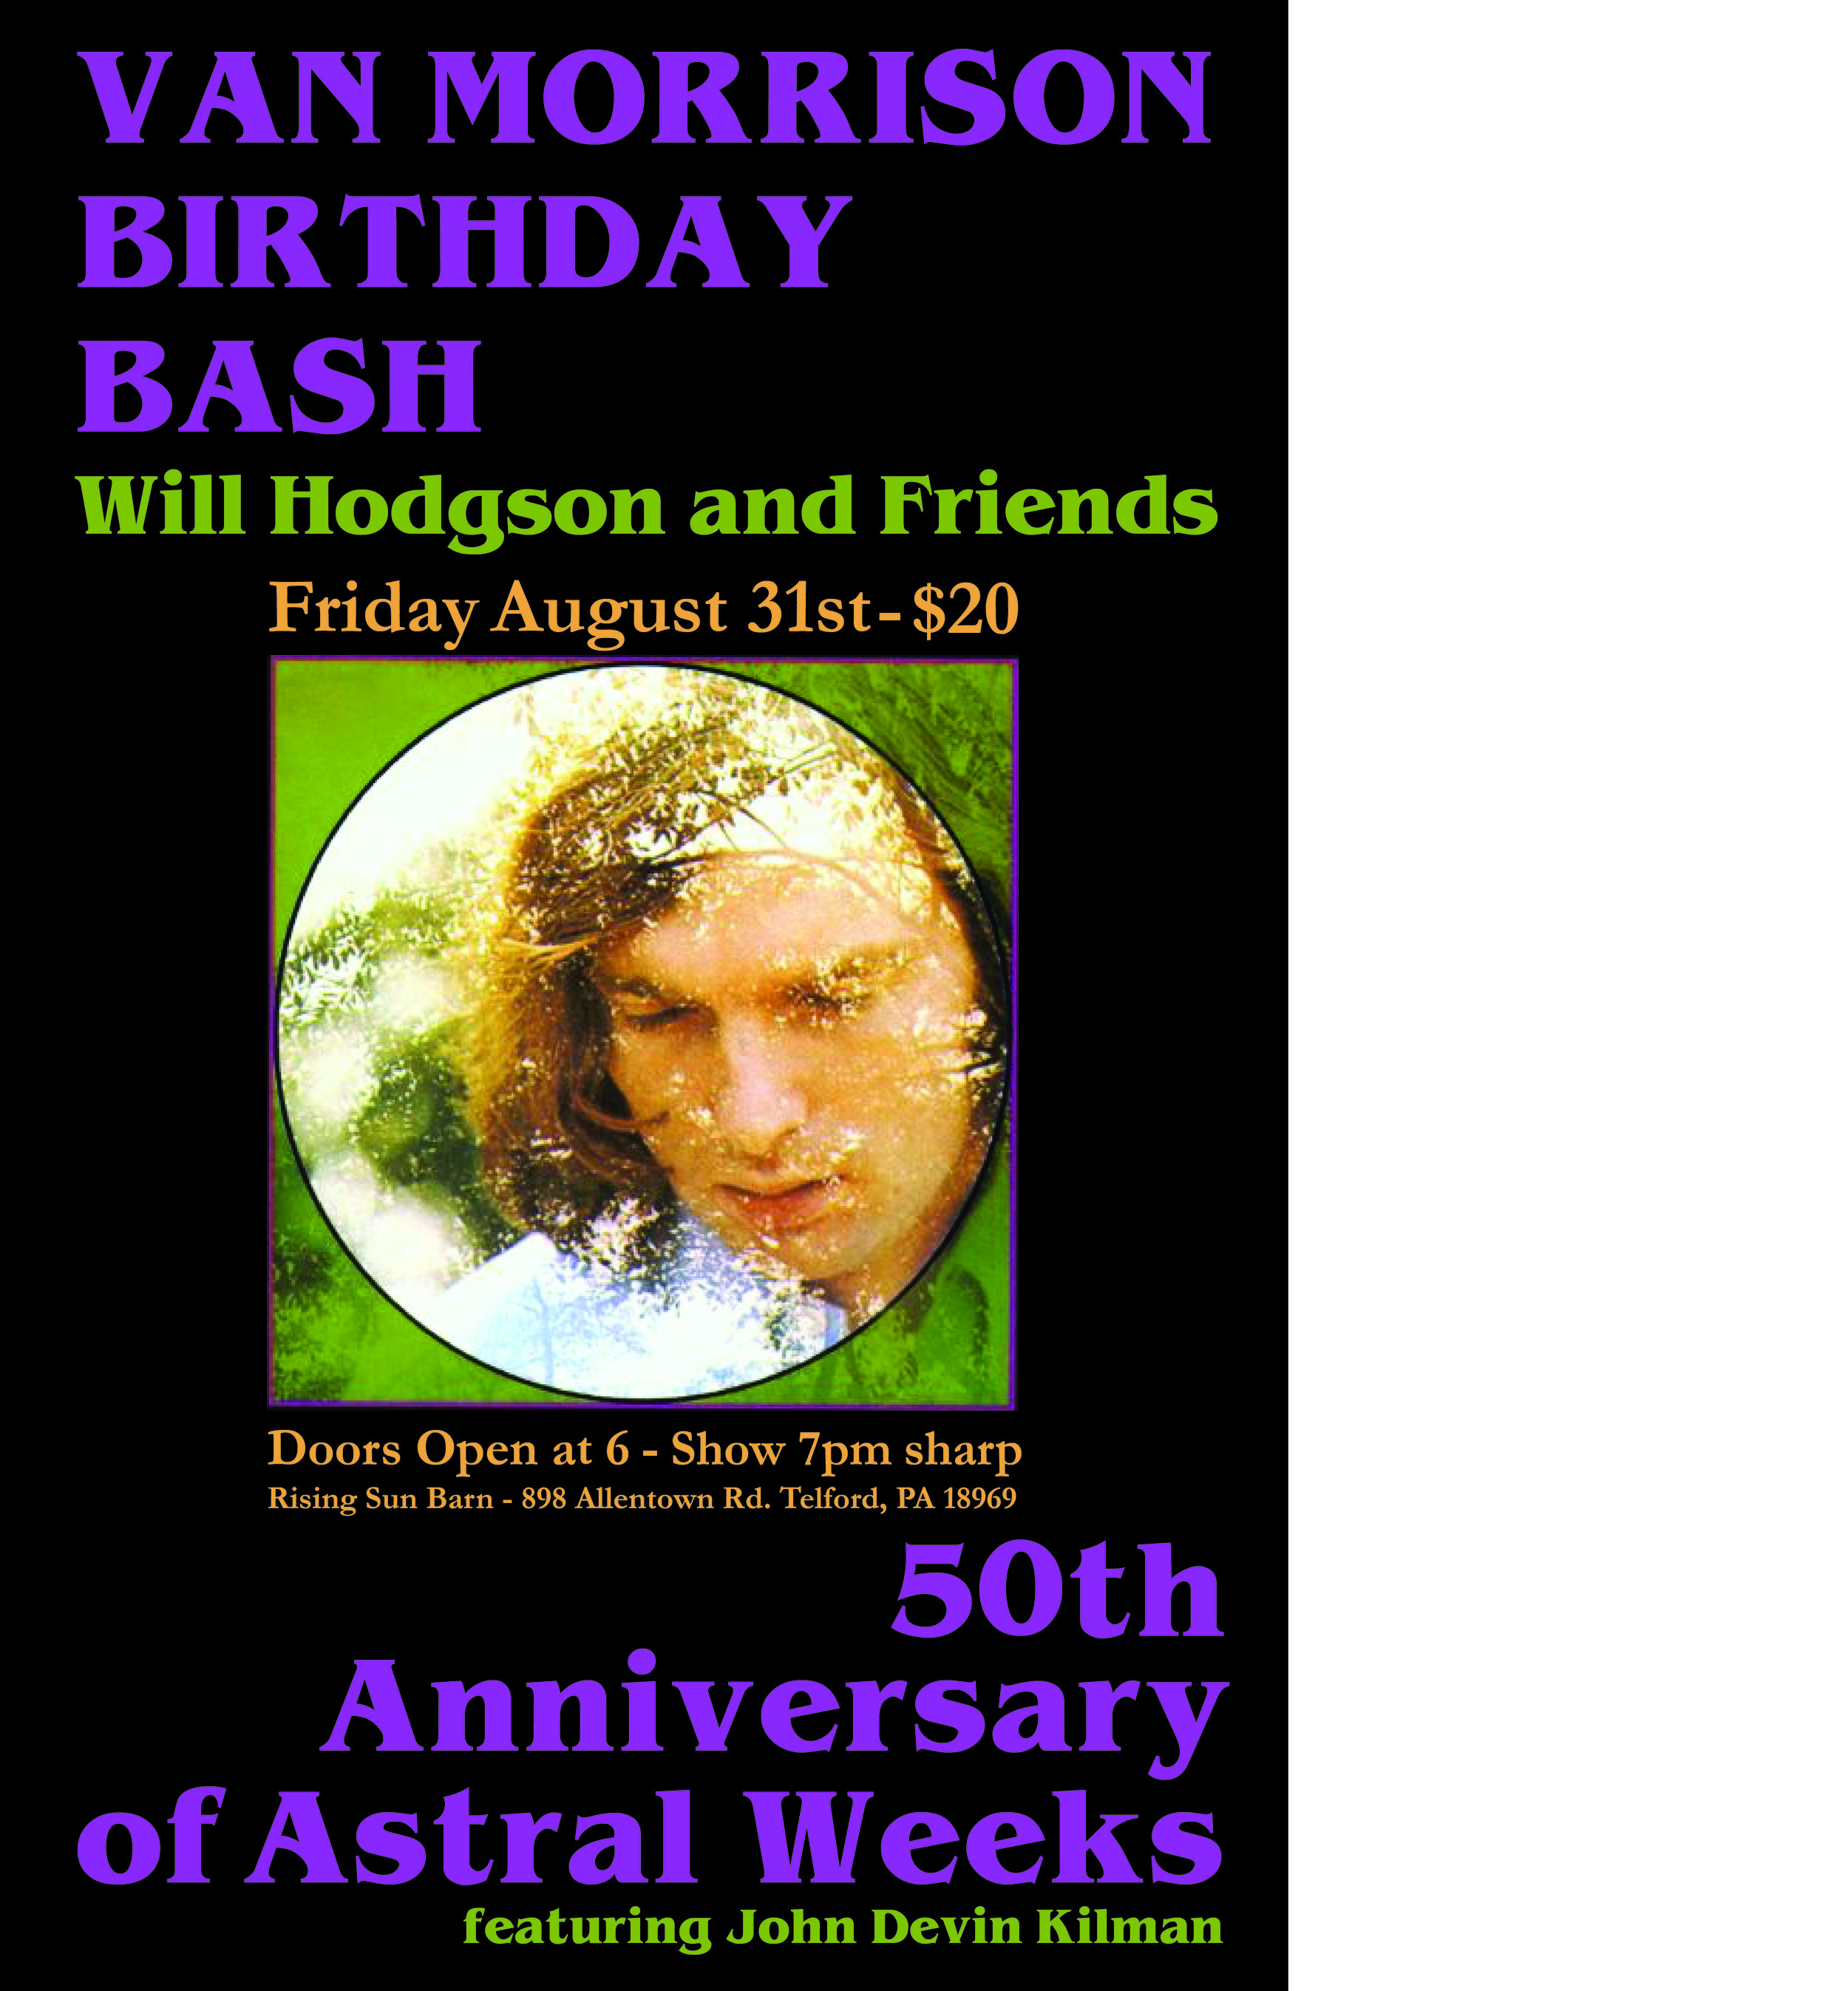 Van Morrison Concert Poster 8-31-18.jpg